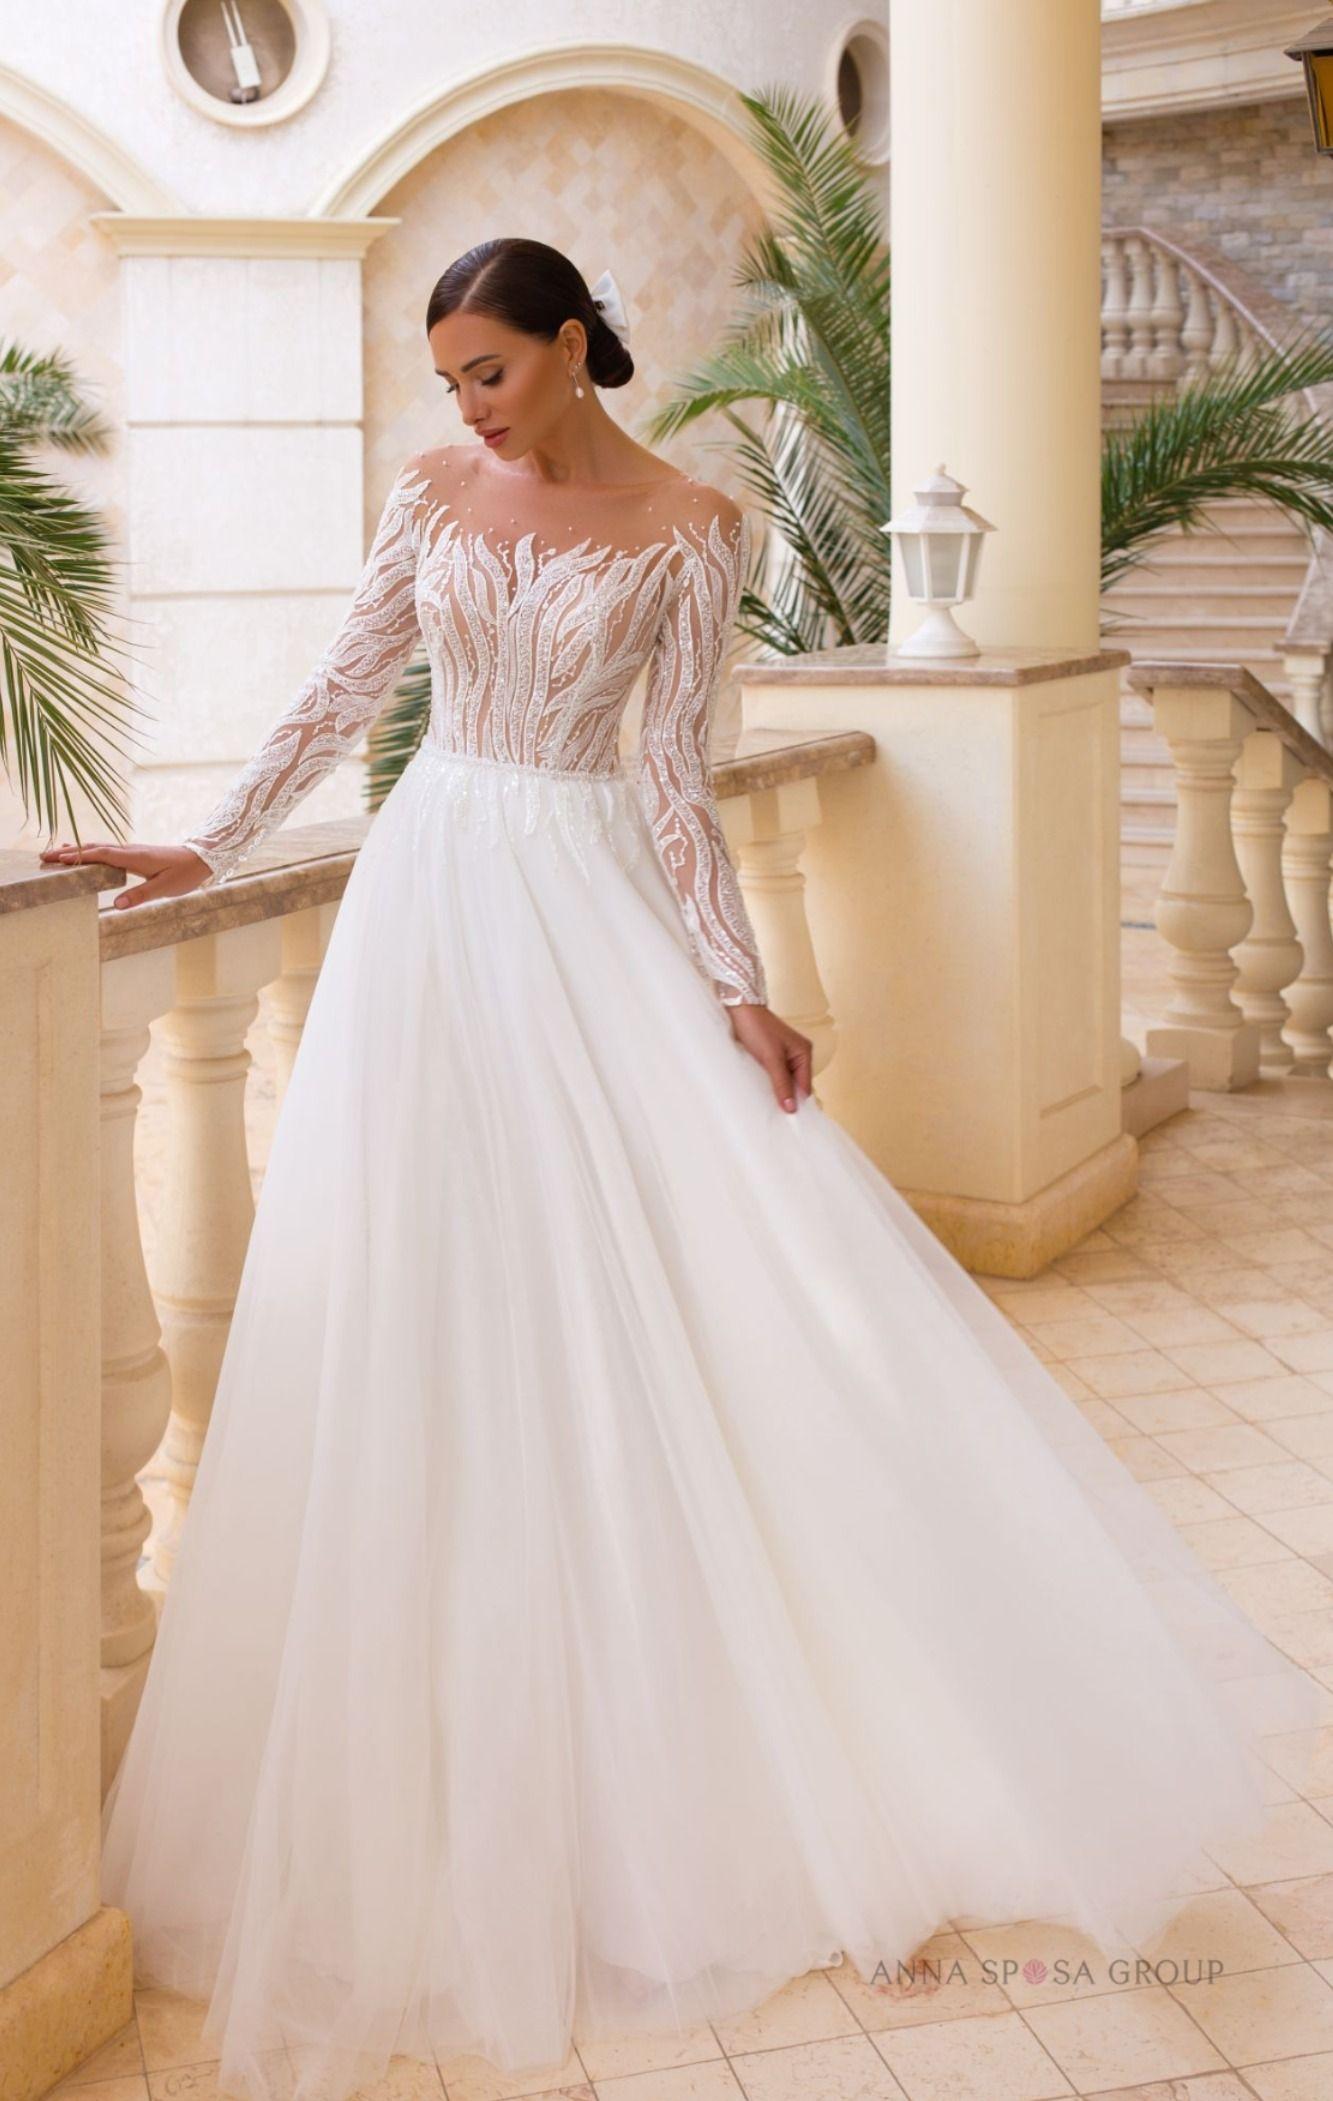 Elvira Wedding Dress Timeless Love Collection Wedding Dress Long Sleeve Long Sleeve Wedding Dress Lace Buy Wedding Dress [ 2101 x 1333 Pixel ]